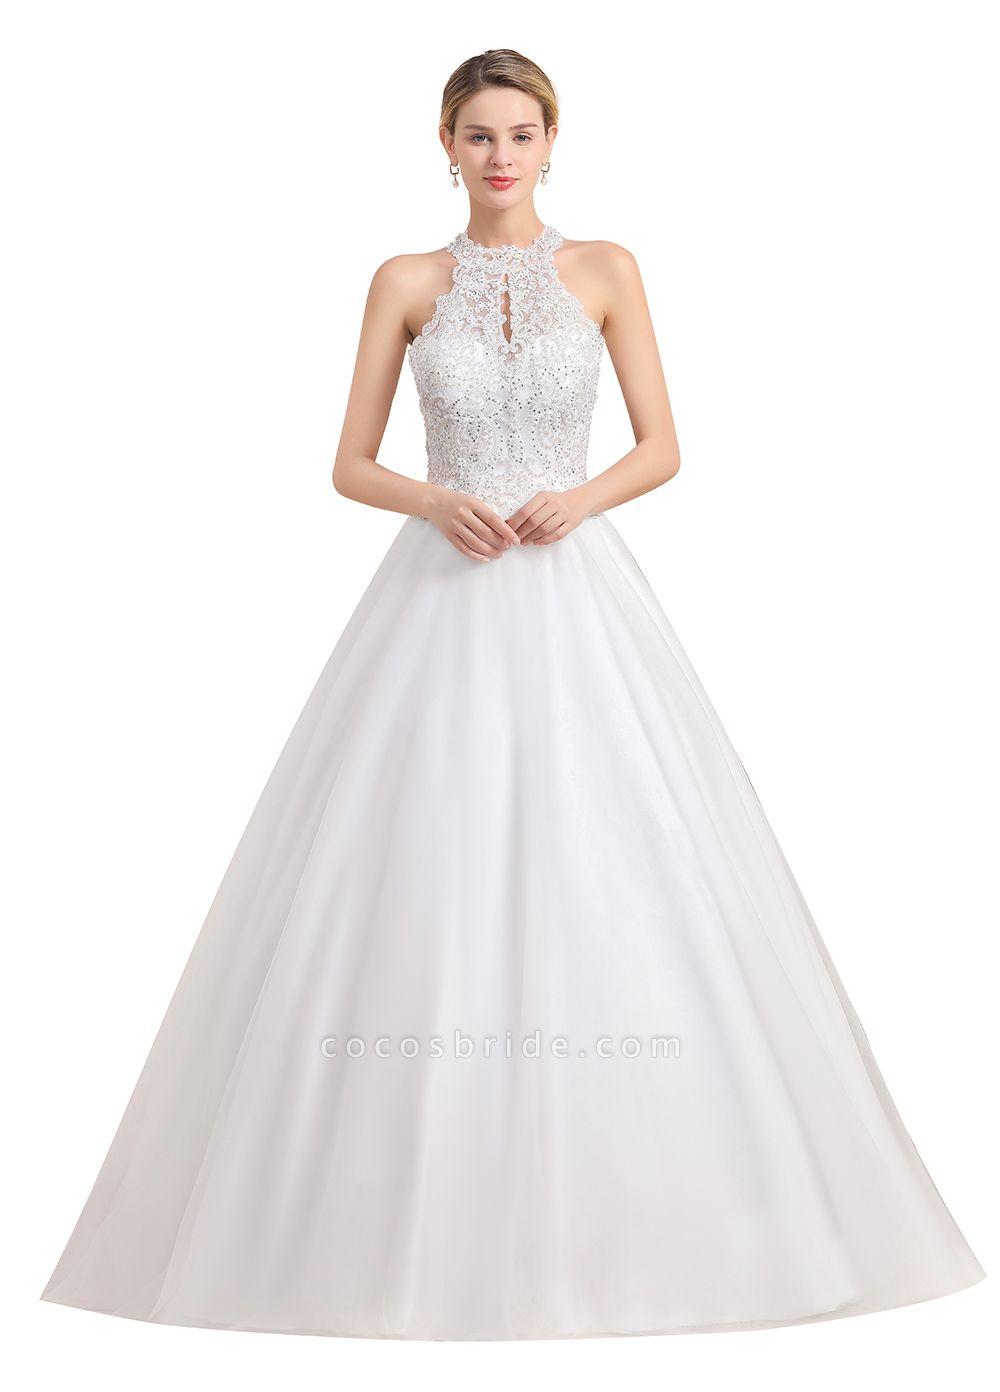 Halter Lace Appliques A-line Sleeveless Wedding Dress